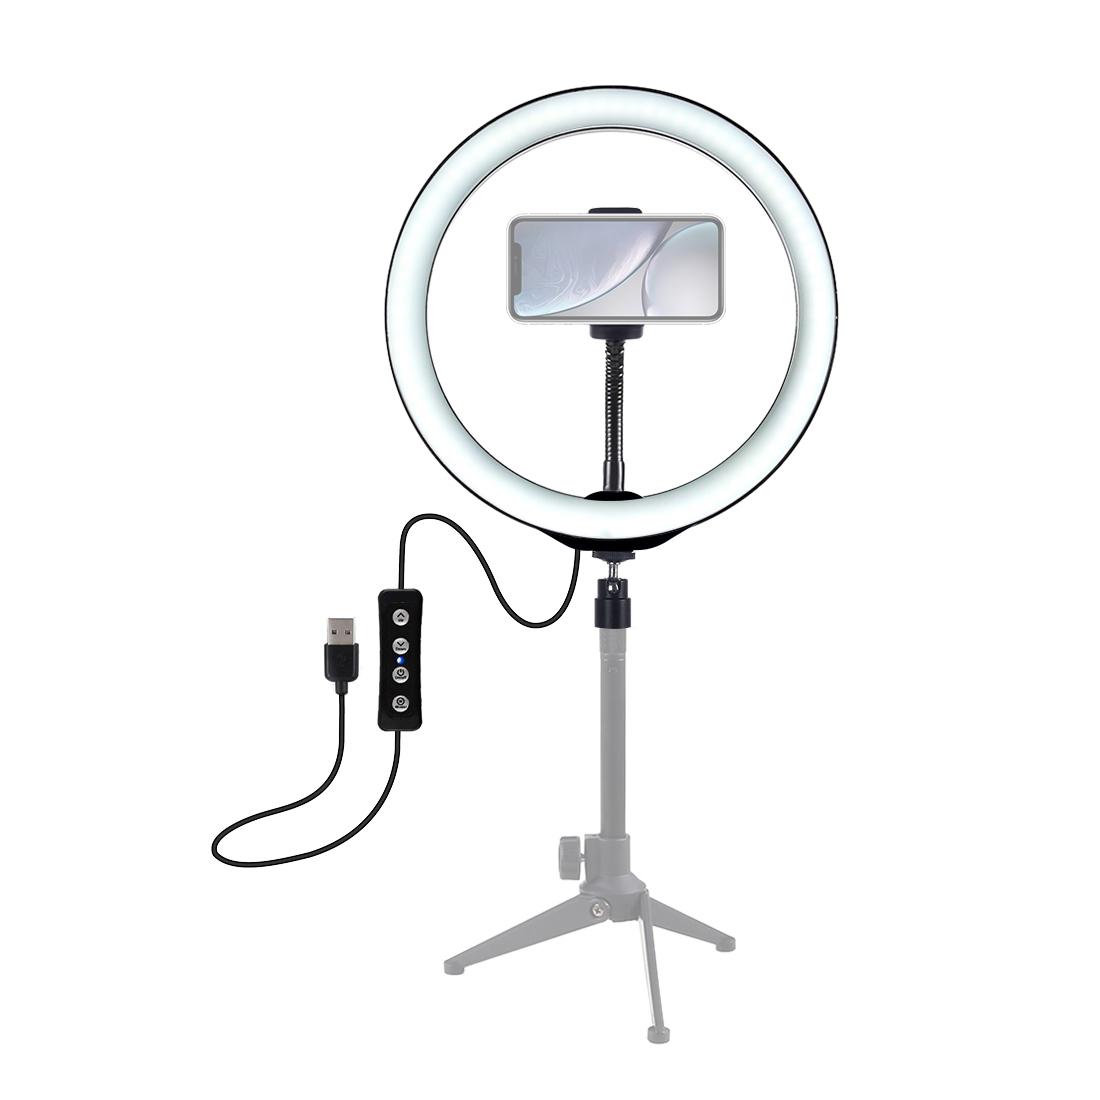 LED 링 라이트 전화 홀더 유튜브 비디오 라이브 스트림 메이크업 사진 Dimmable Selfie 반지 빛